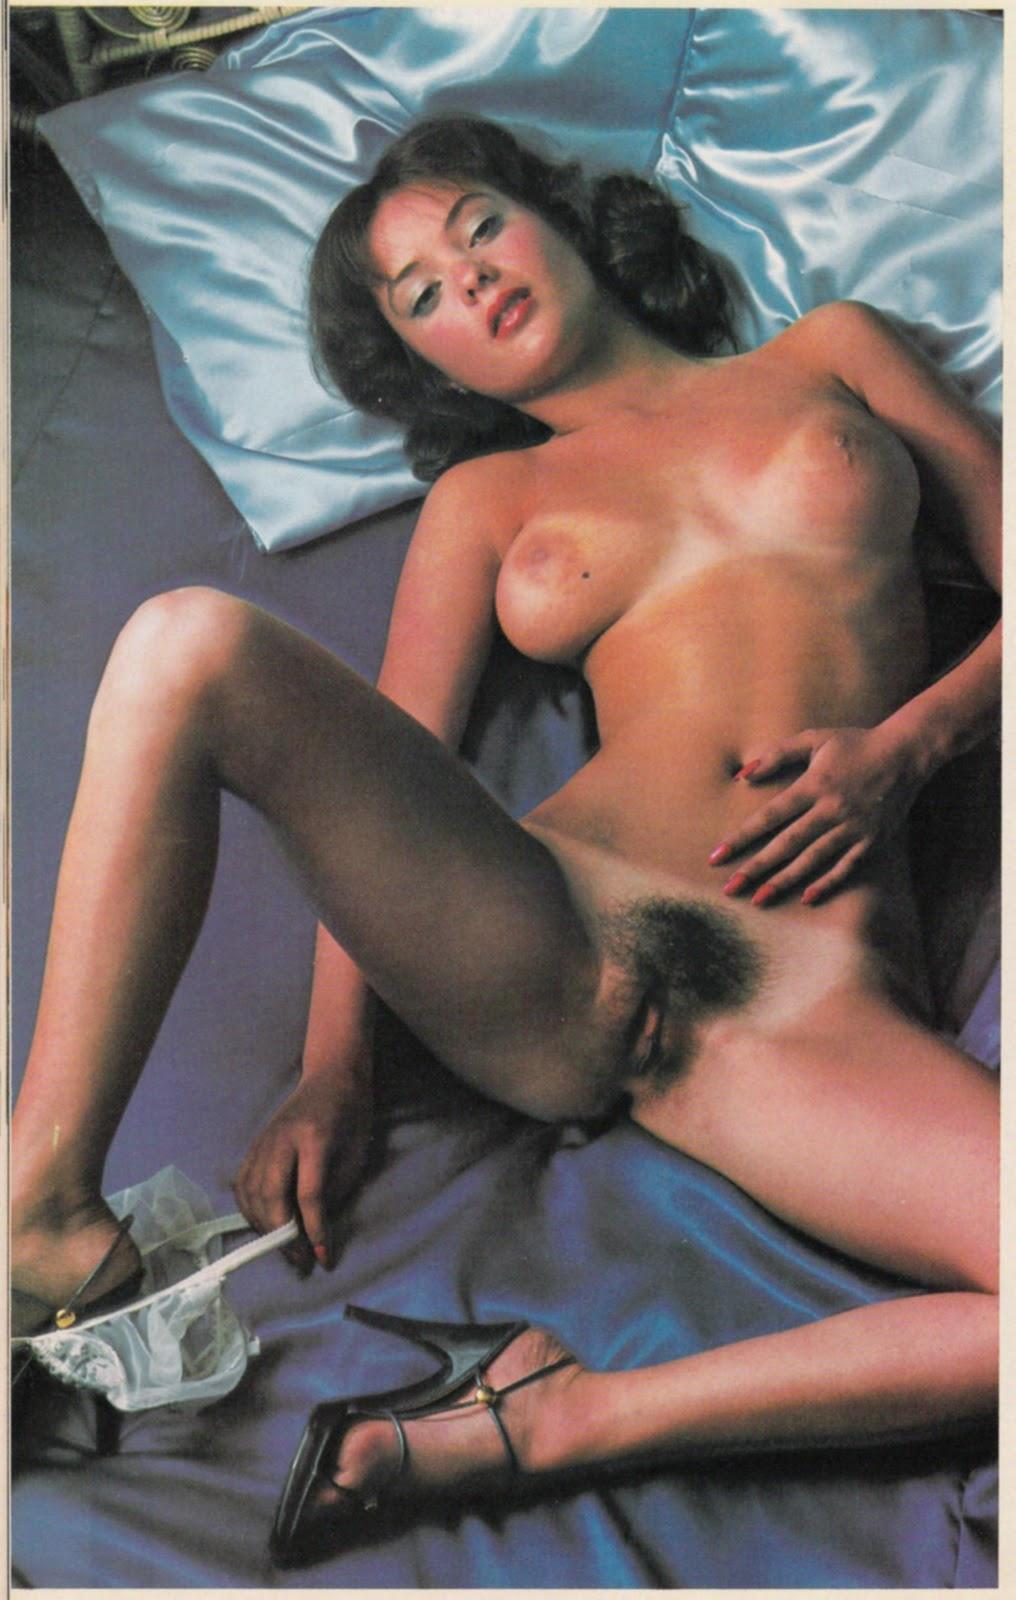 Classic Pornstar: Desiree Cousteau